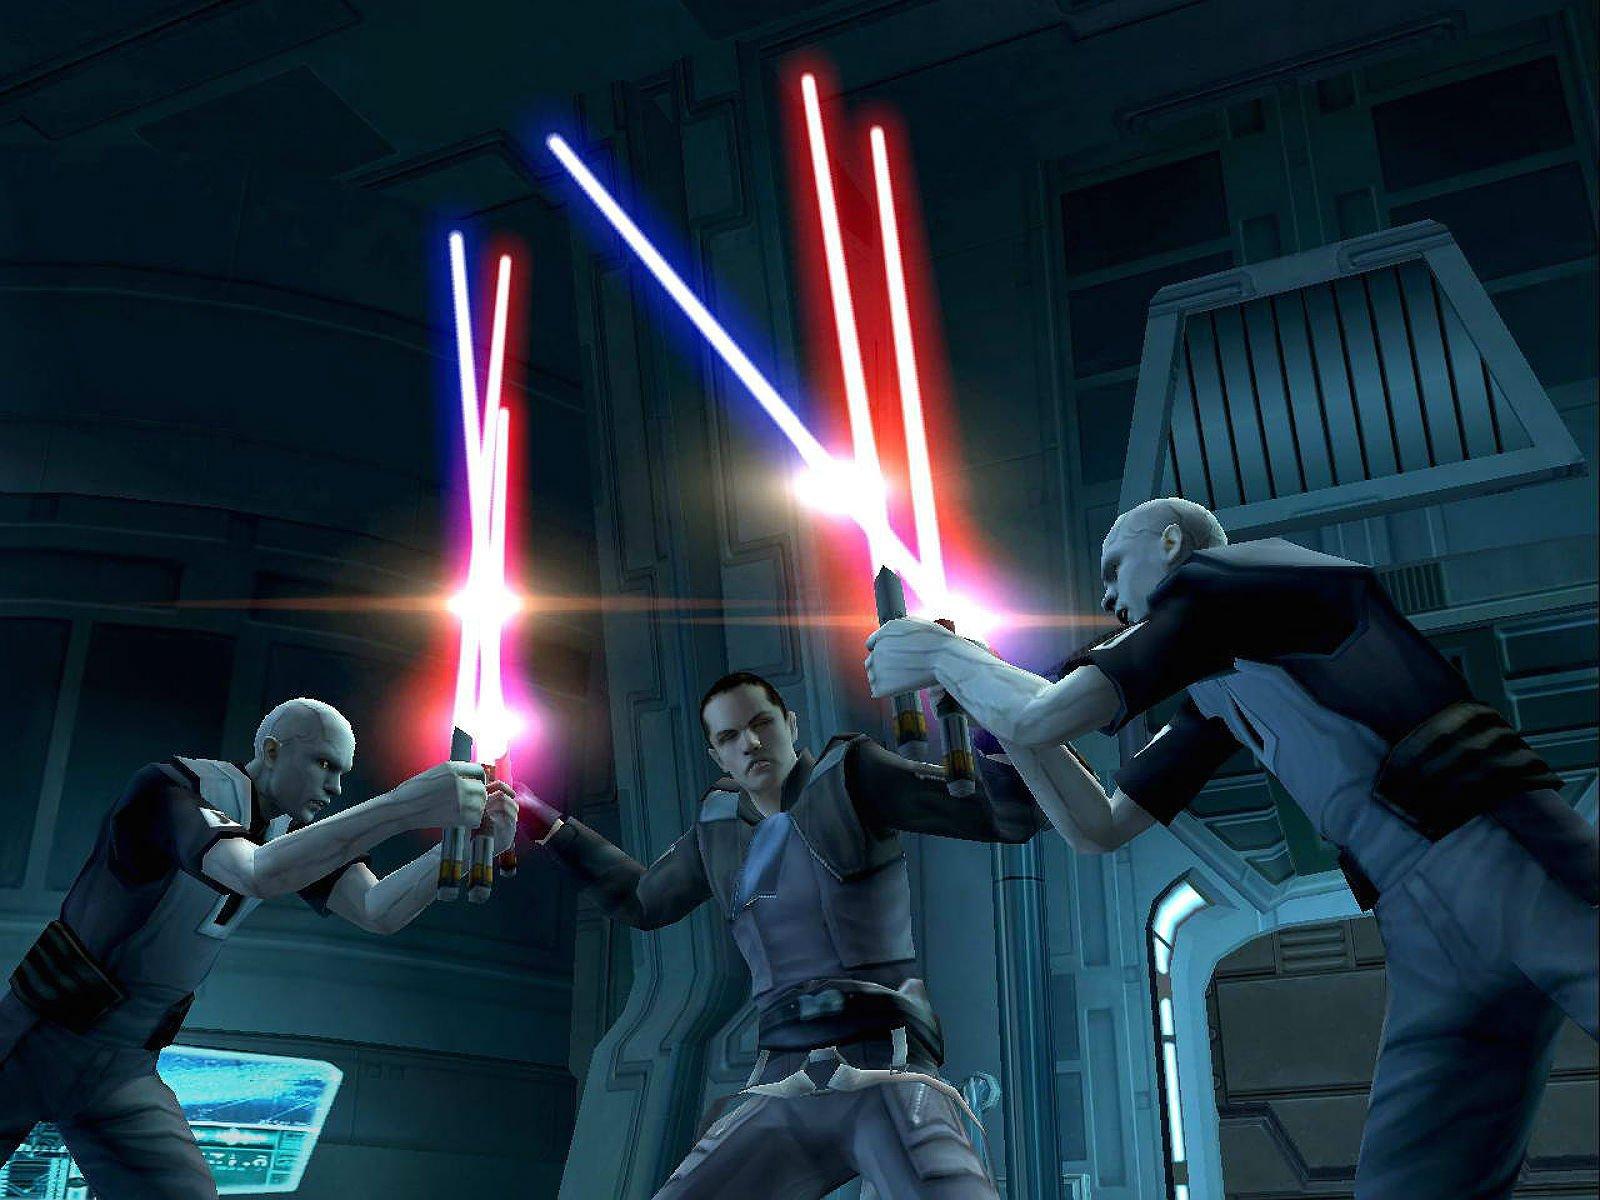 star wars games - HD1280×960